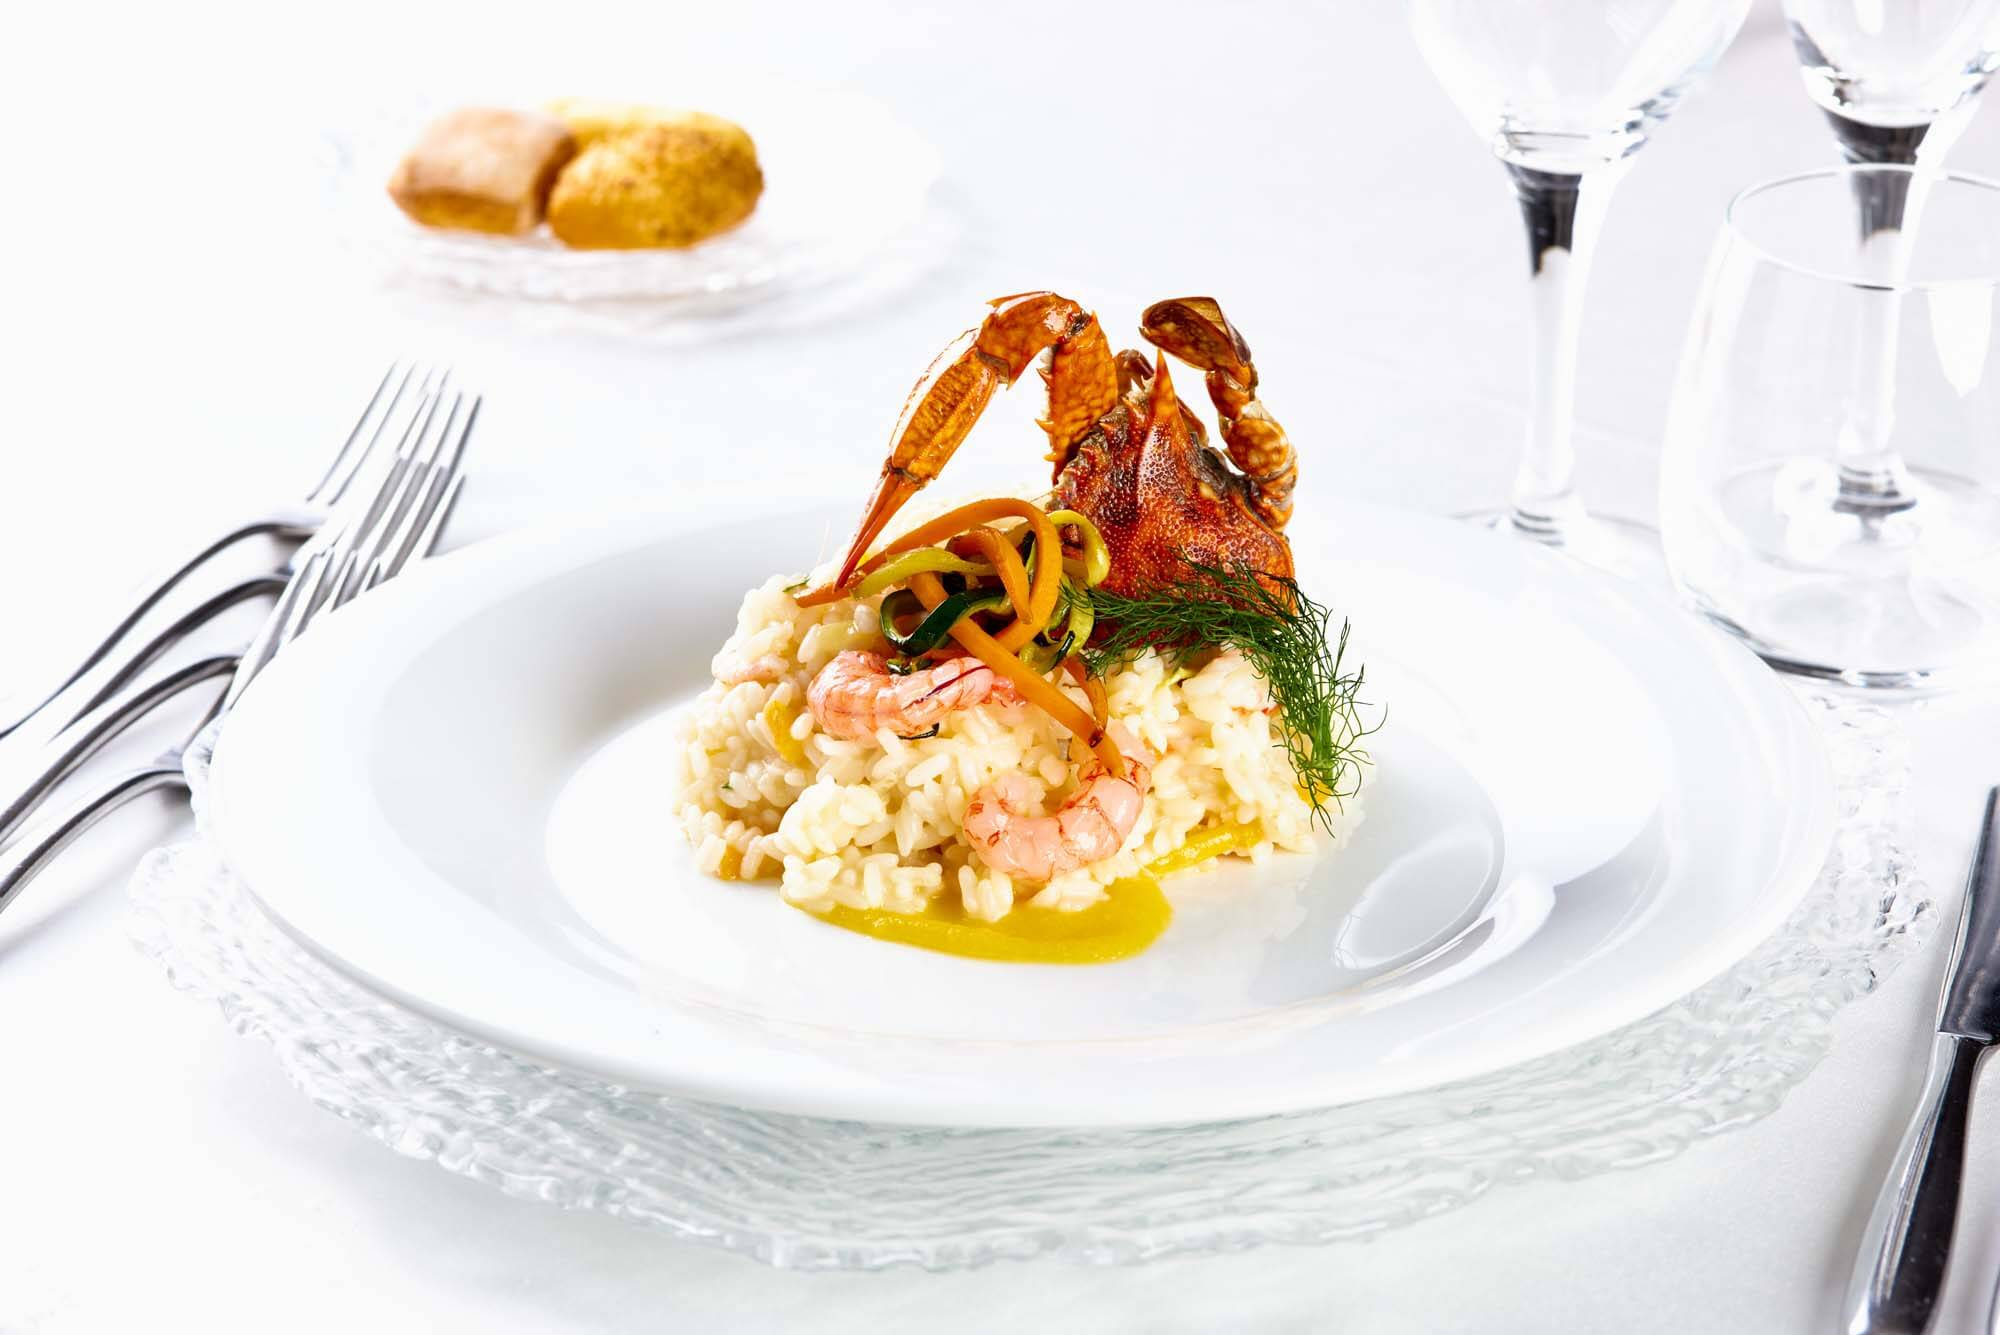 bbadv-photoshooting-food-villa-fabiana-17